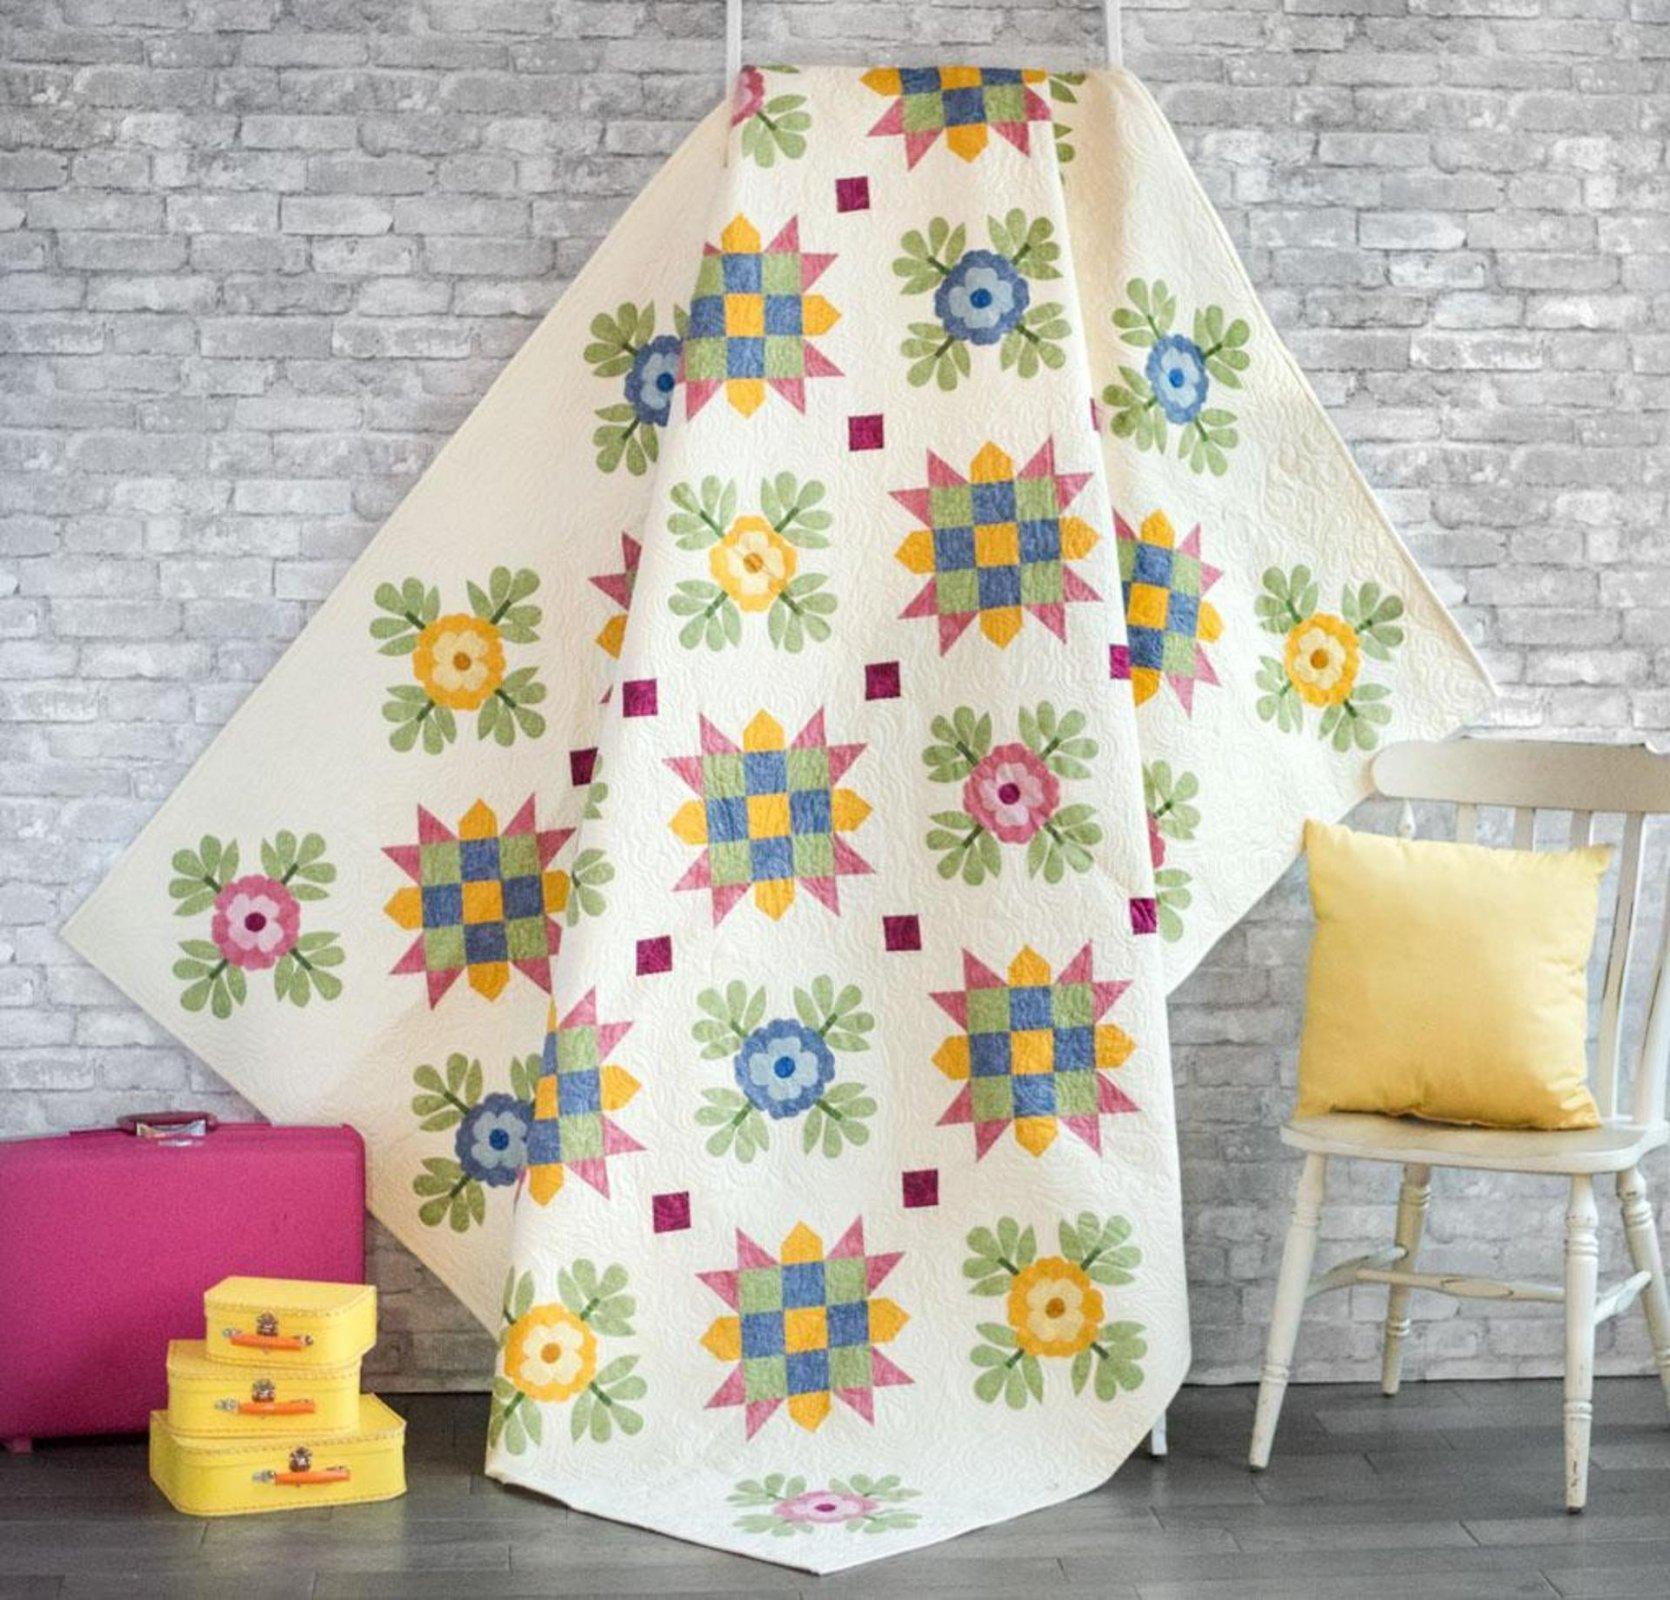 Flowers For My Sister Quilt Kit - Christine Stainbrook - RJR Jinny Beyer